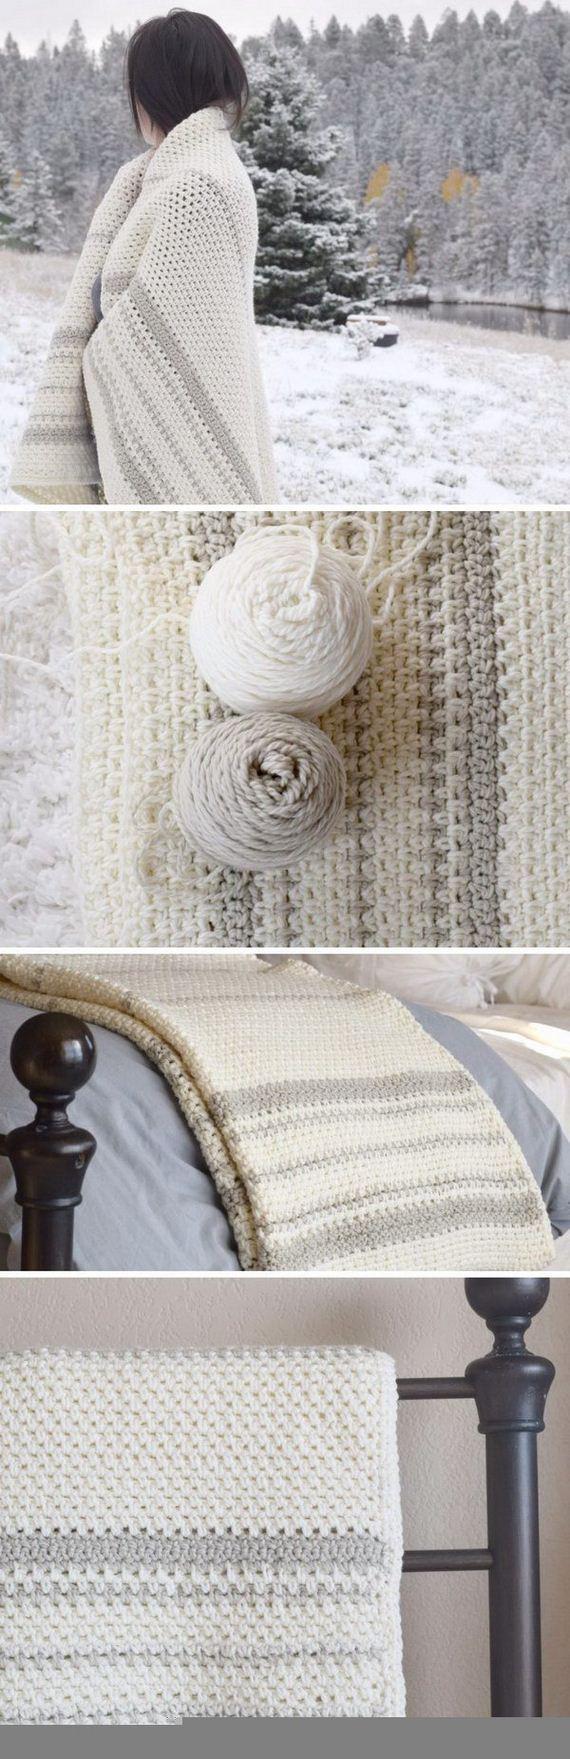 03-crochet-blankets